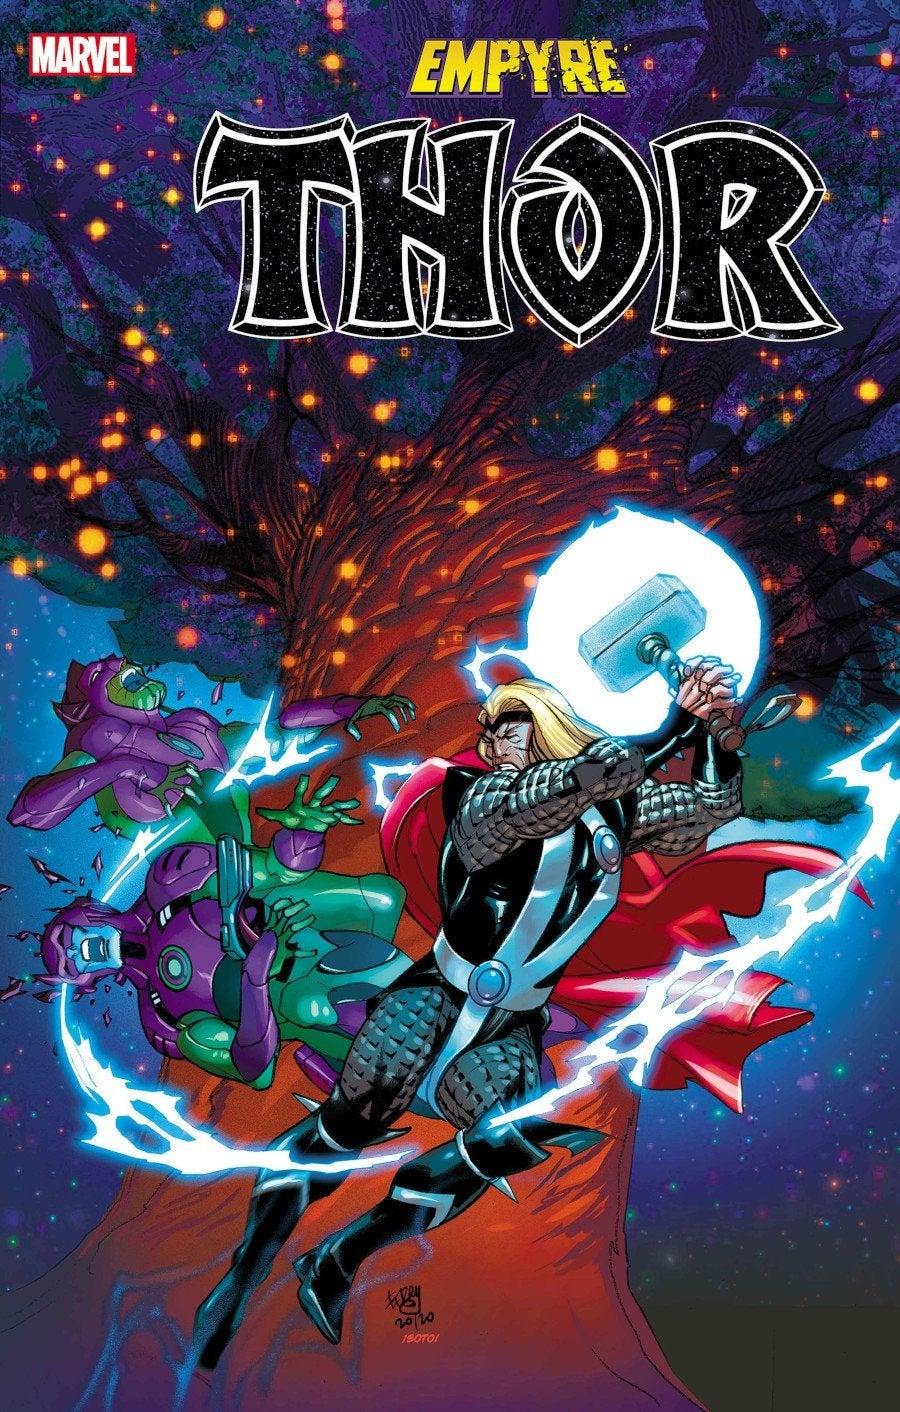 Empyre Thor